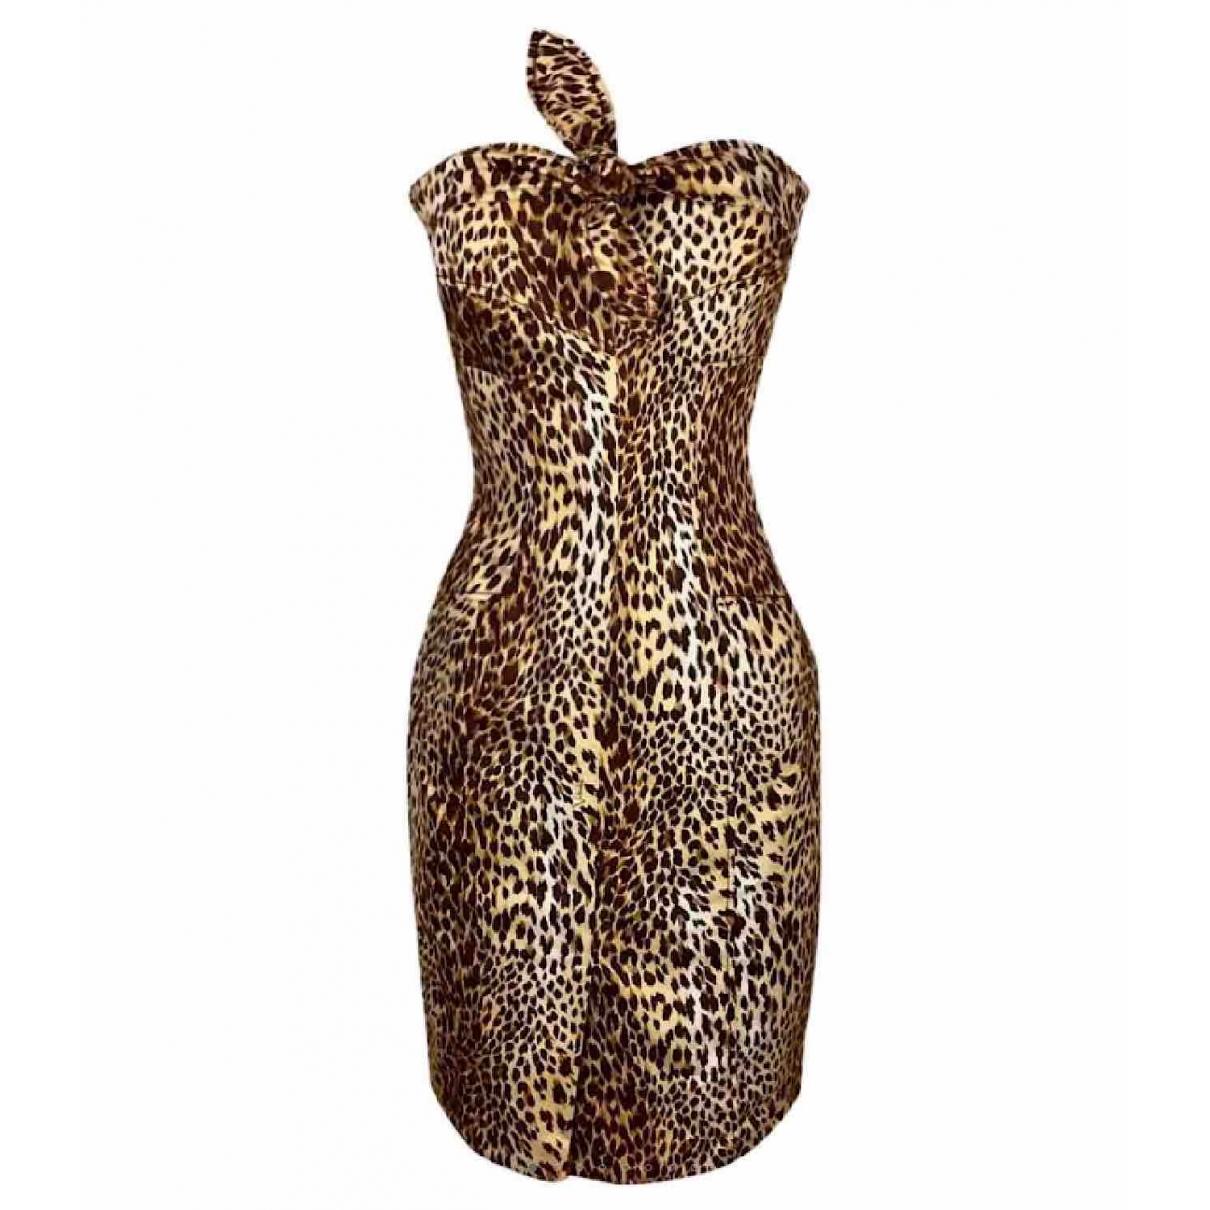 Valentino Garavani \N Kleid in  Braun Baumwolle - Elasthan